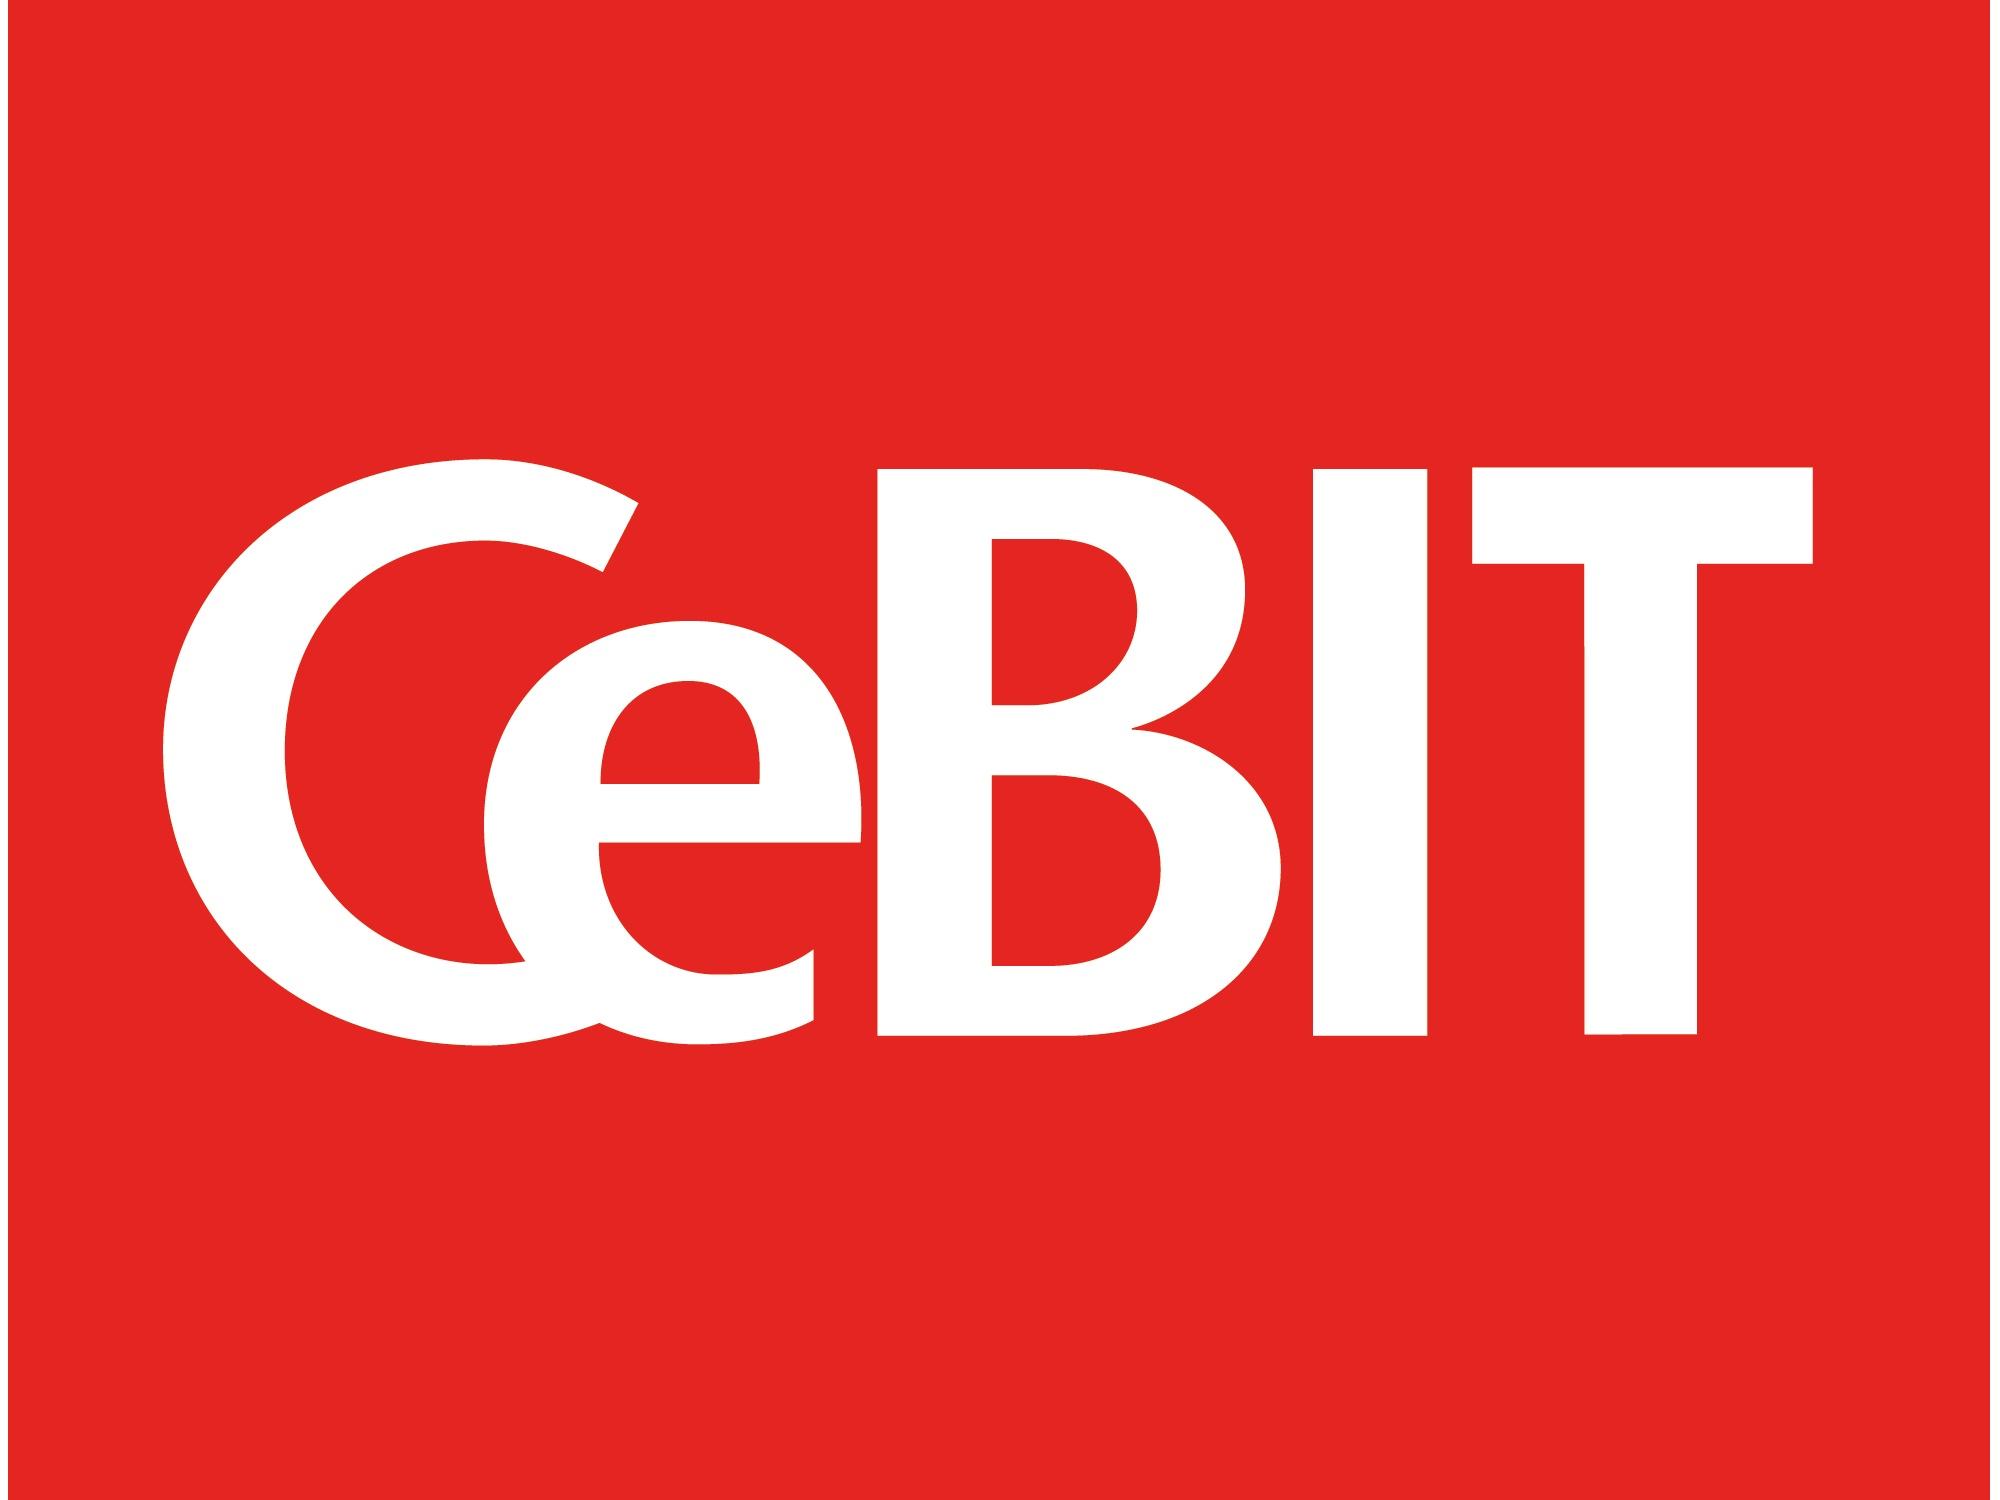 CeBIT Logo photo - 1